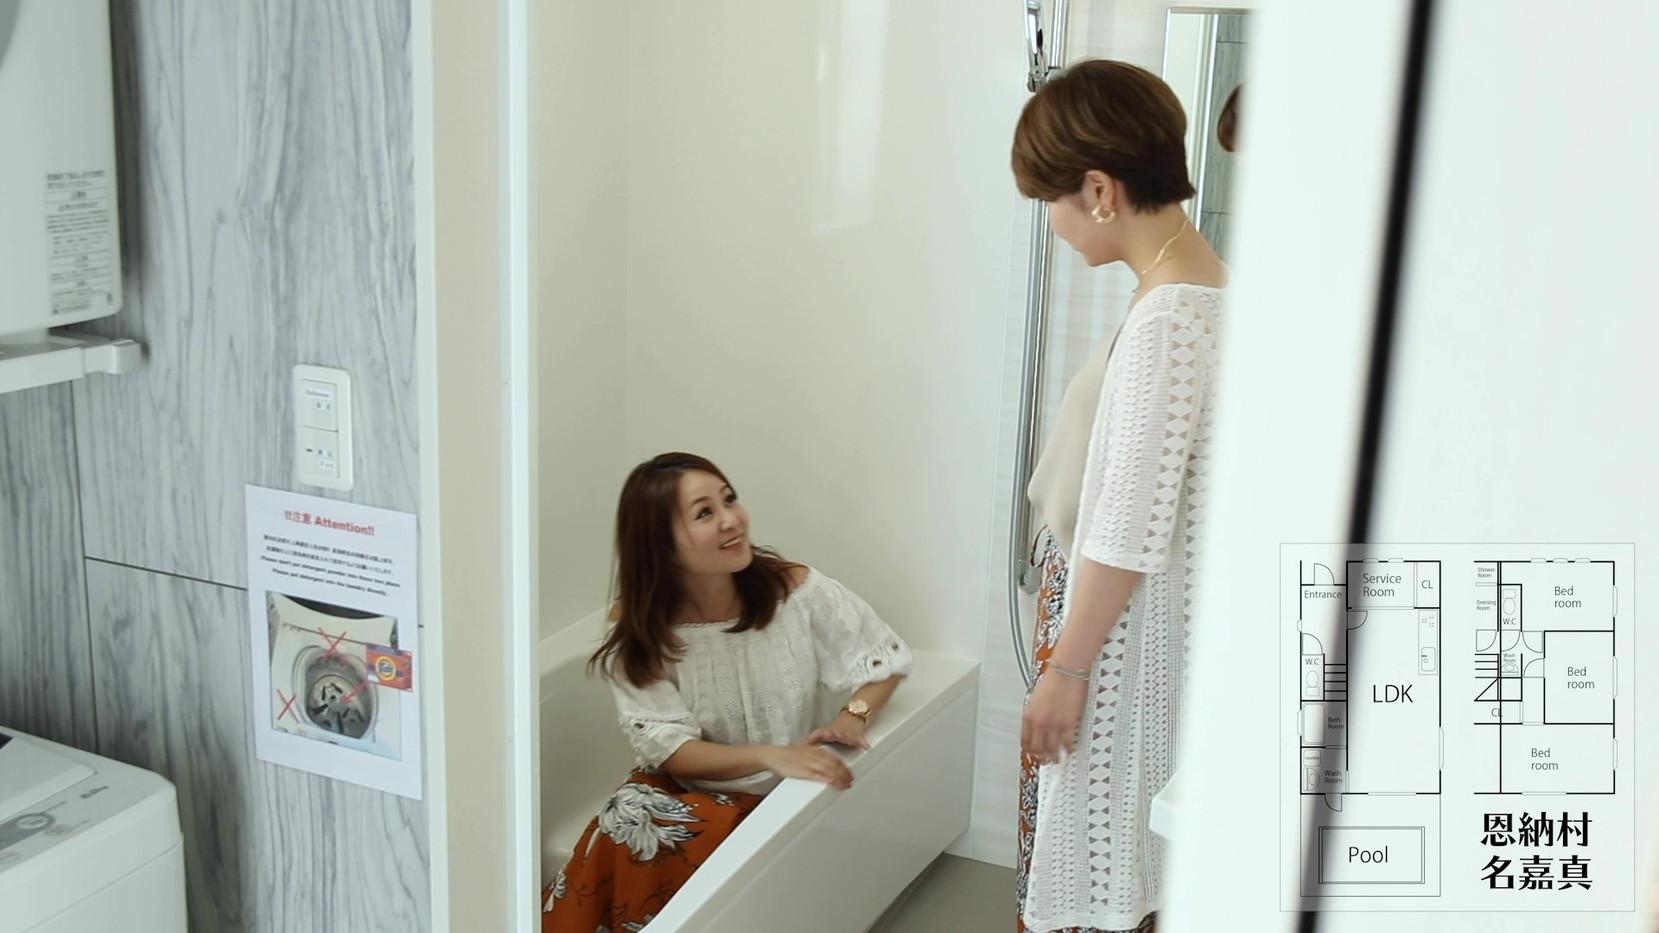 名嘉真01_Moment(13).jpg